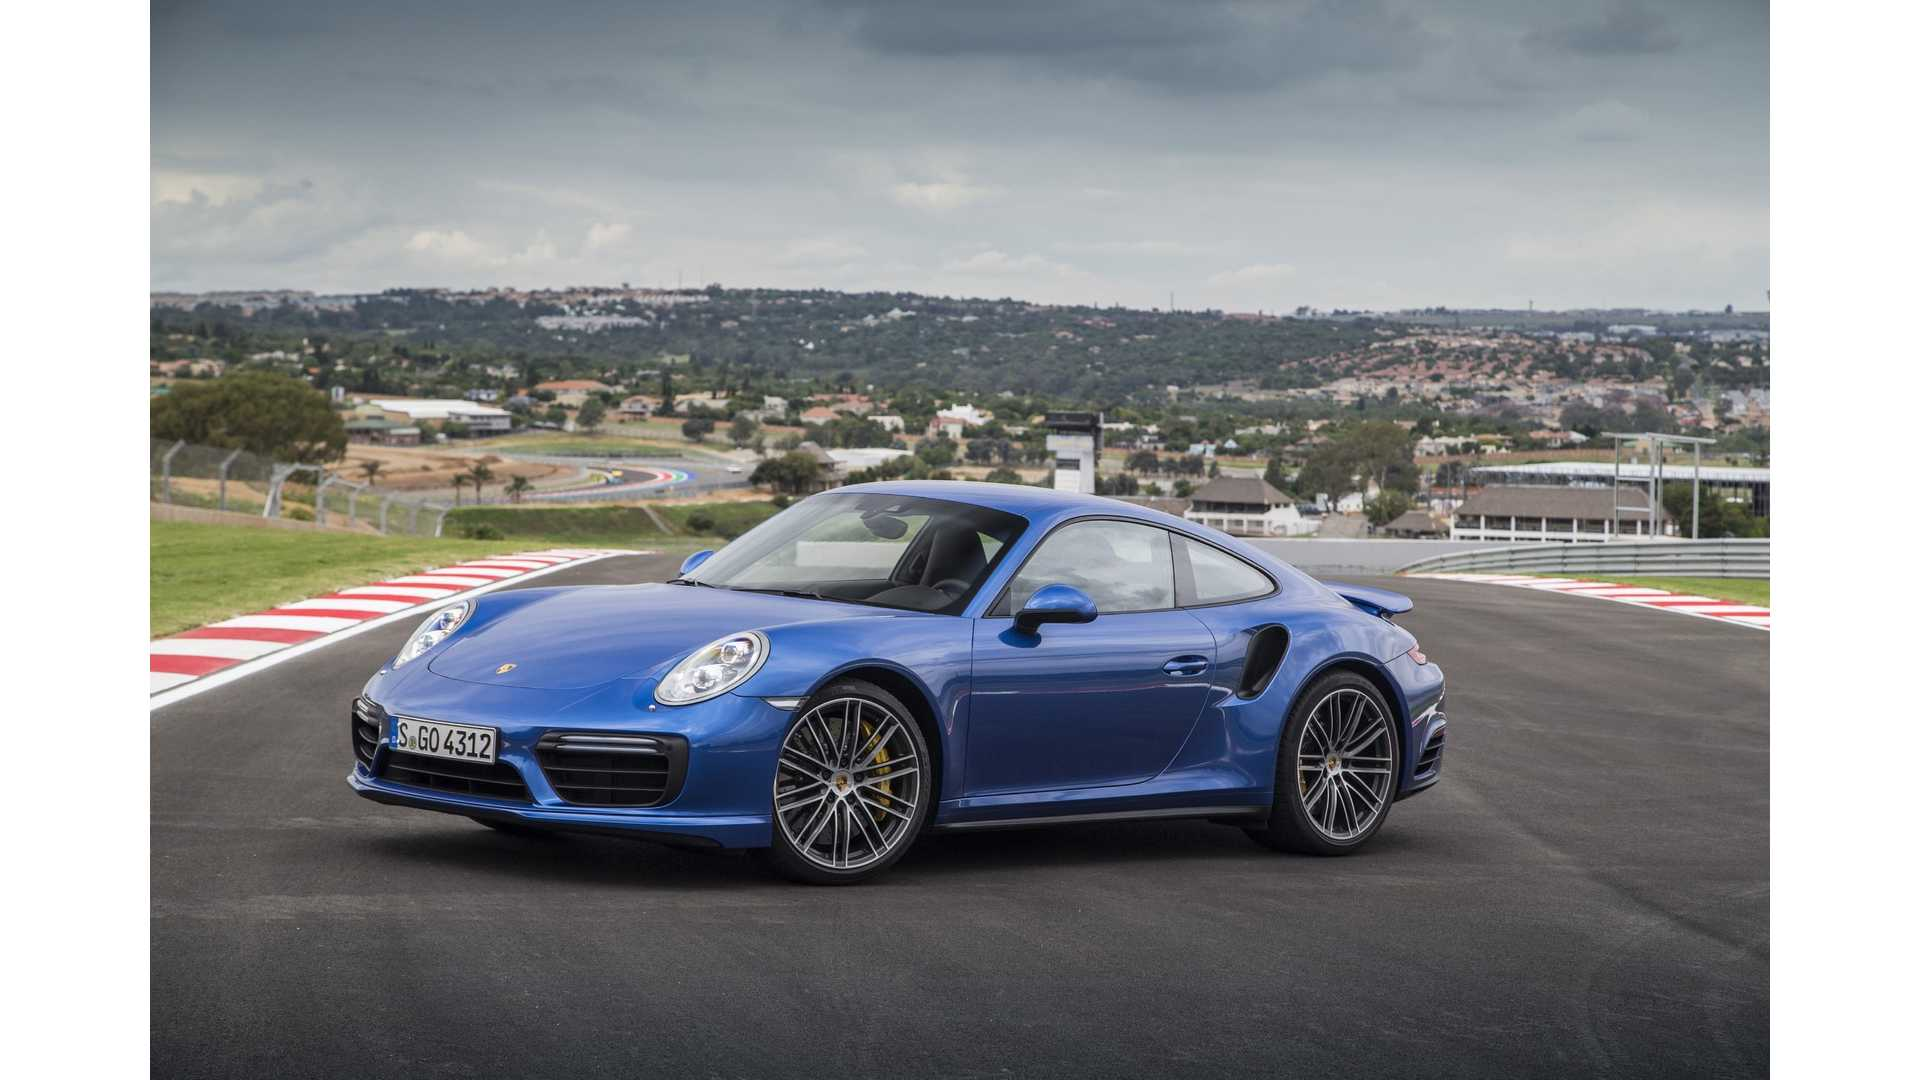 Porsche Carrera S More Powerful More Dynamic